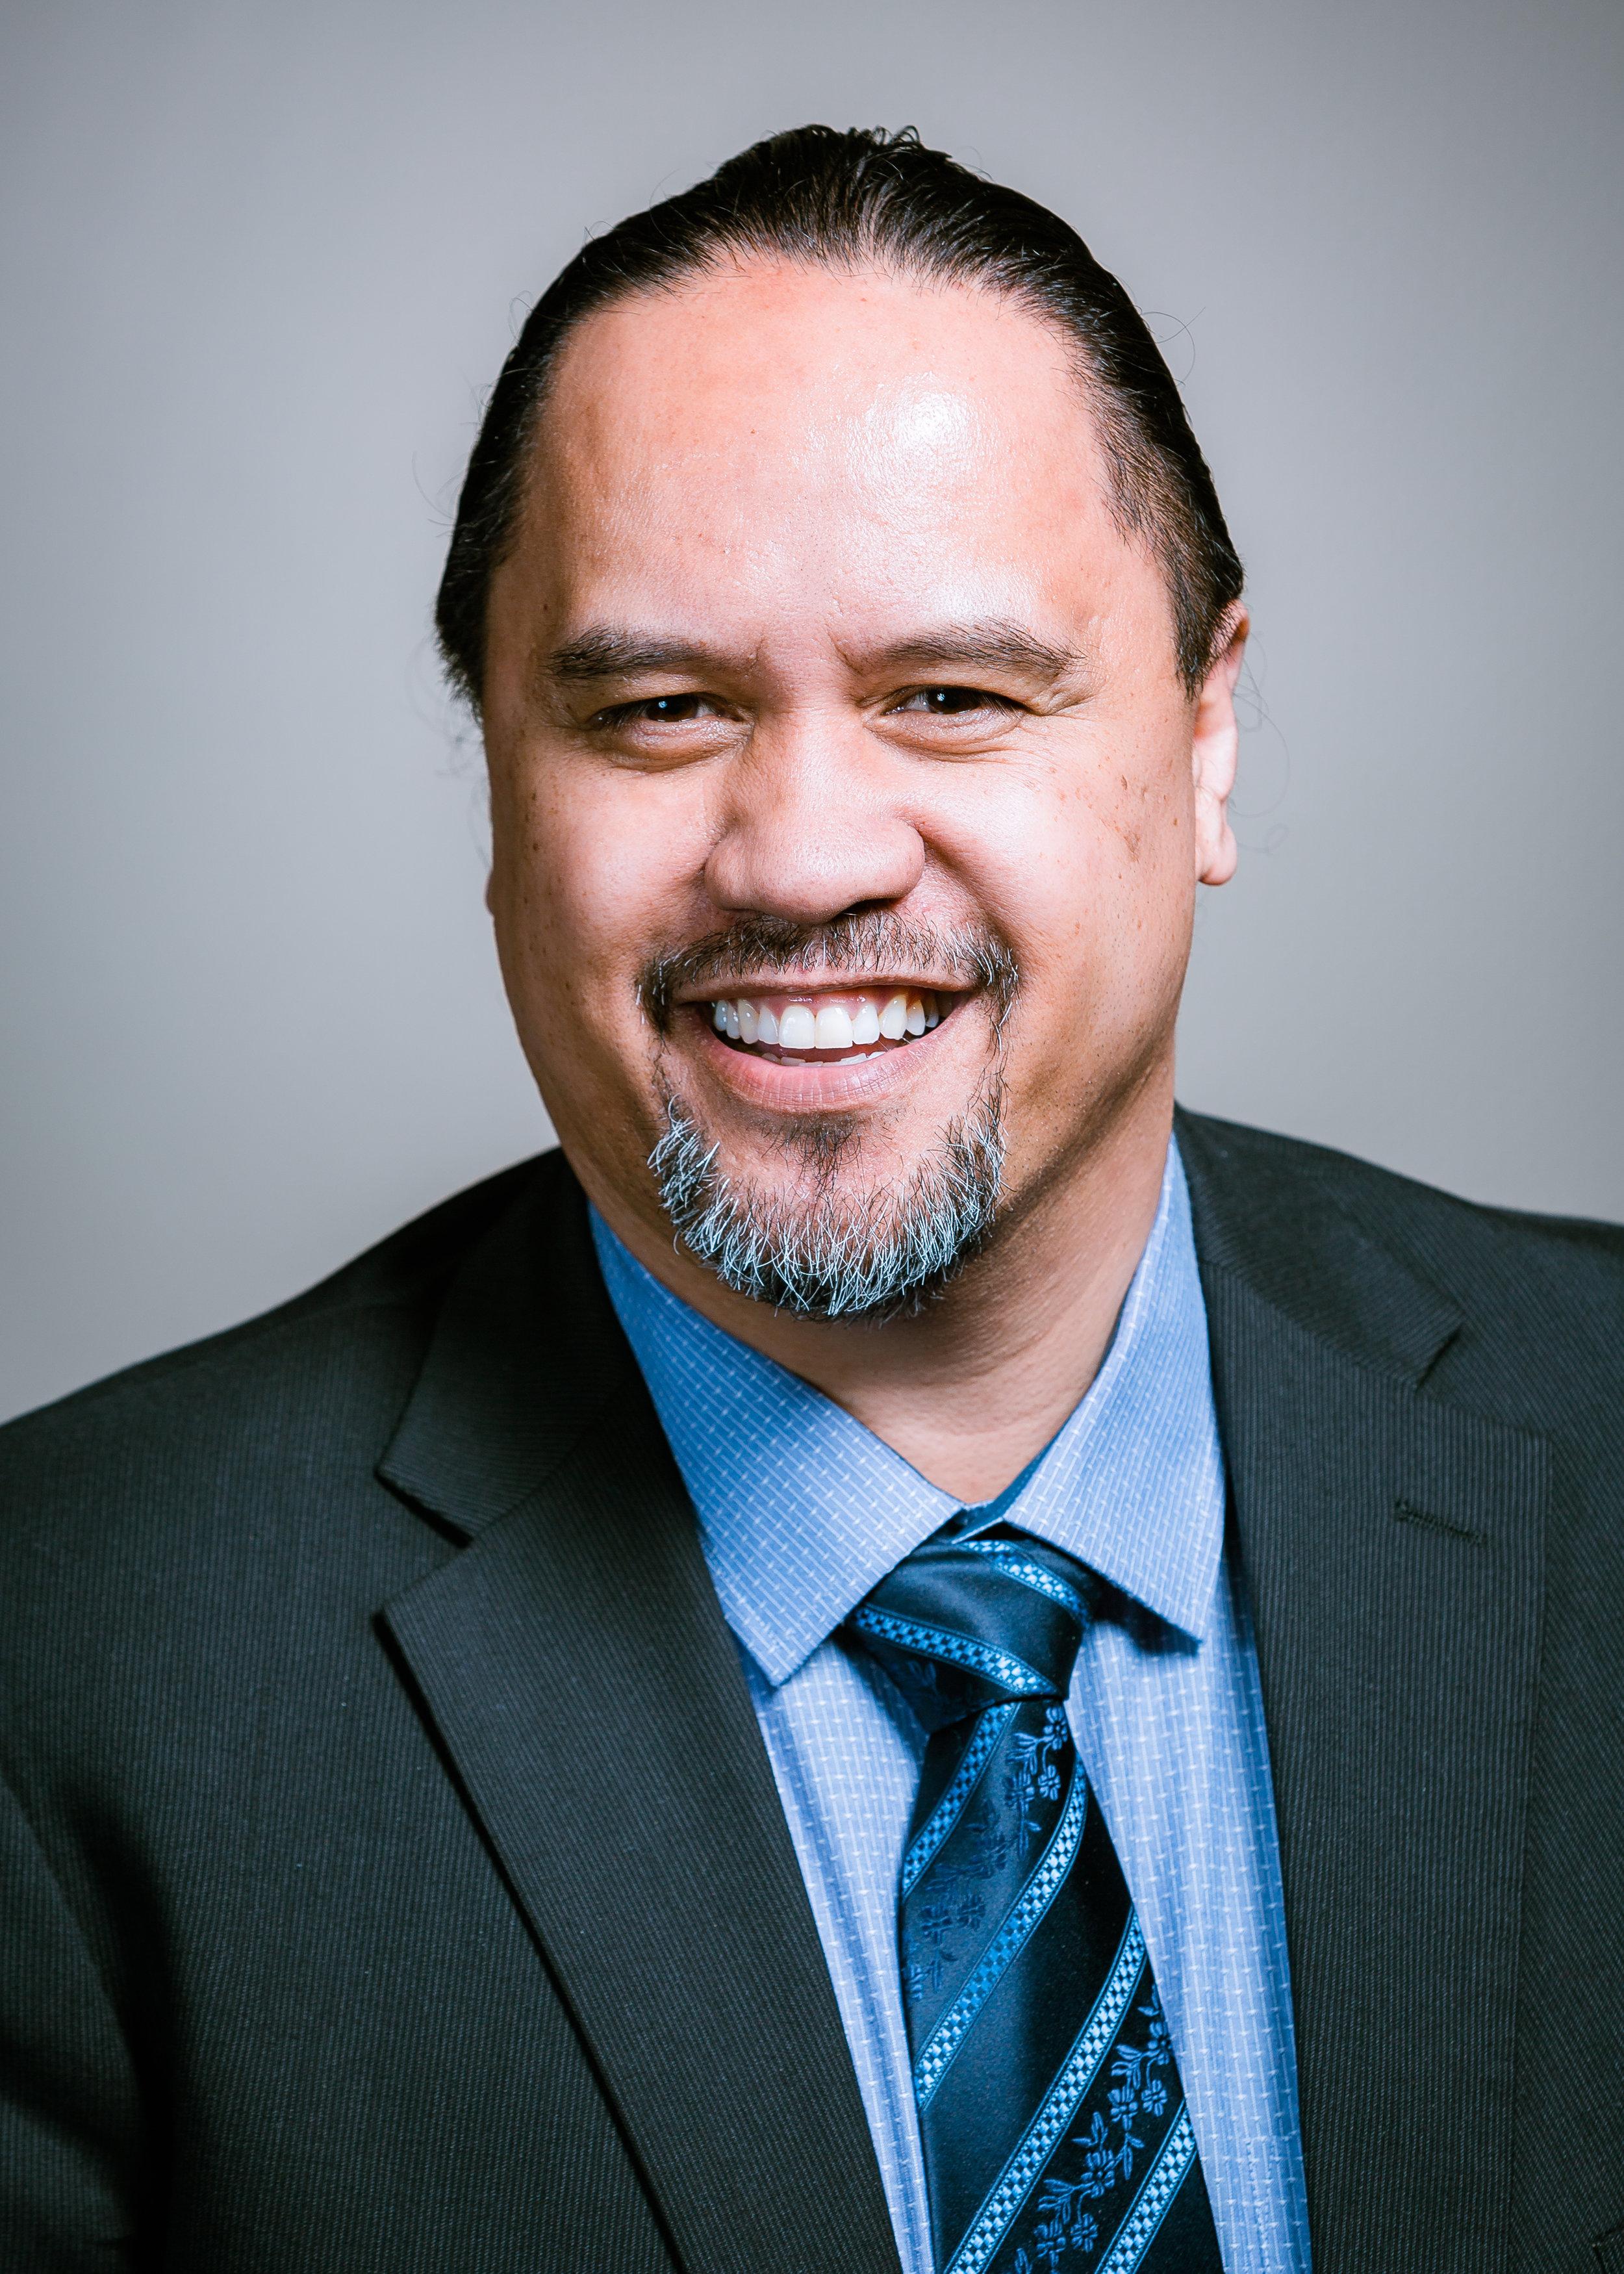 WARREN WILLIAMS - EXECUTIVE DIRECTOR–OPERATIONSEmail:warren.williams@waikatotainui.ac.nzIwi/Hapuu: Tuuhoe, Te Urewera, Waikato, Ngaati MaahangaQualifications: BCMS, PgDipMgtSt, MBA